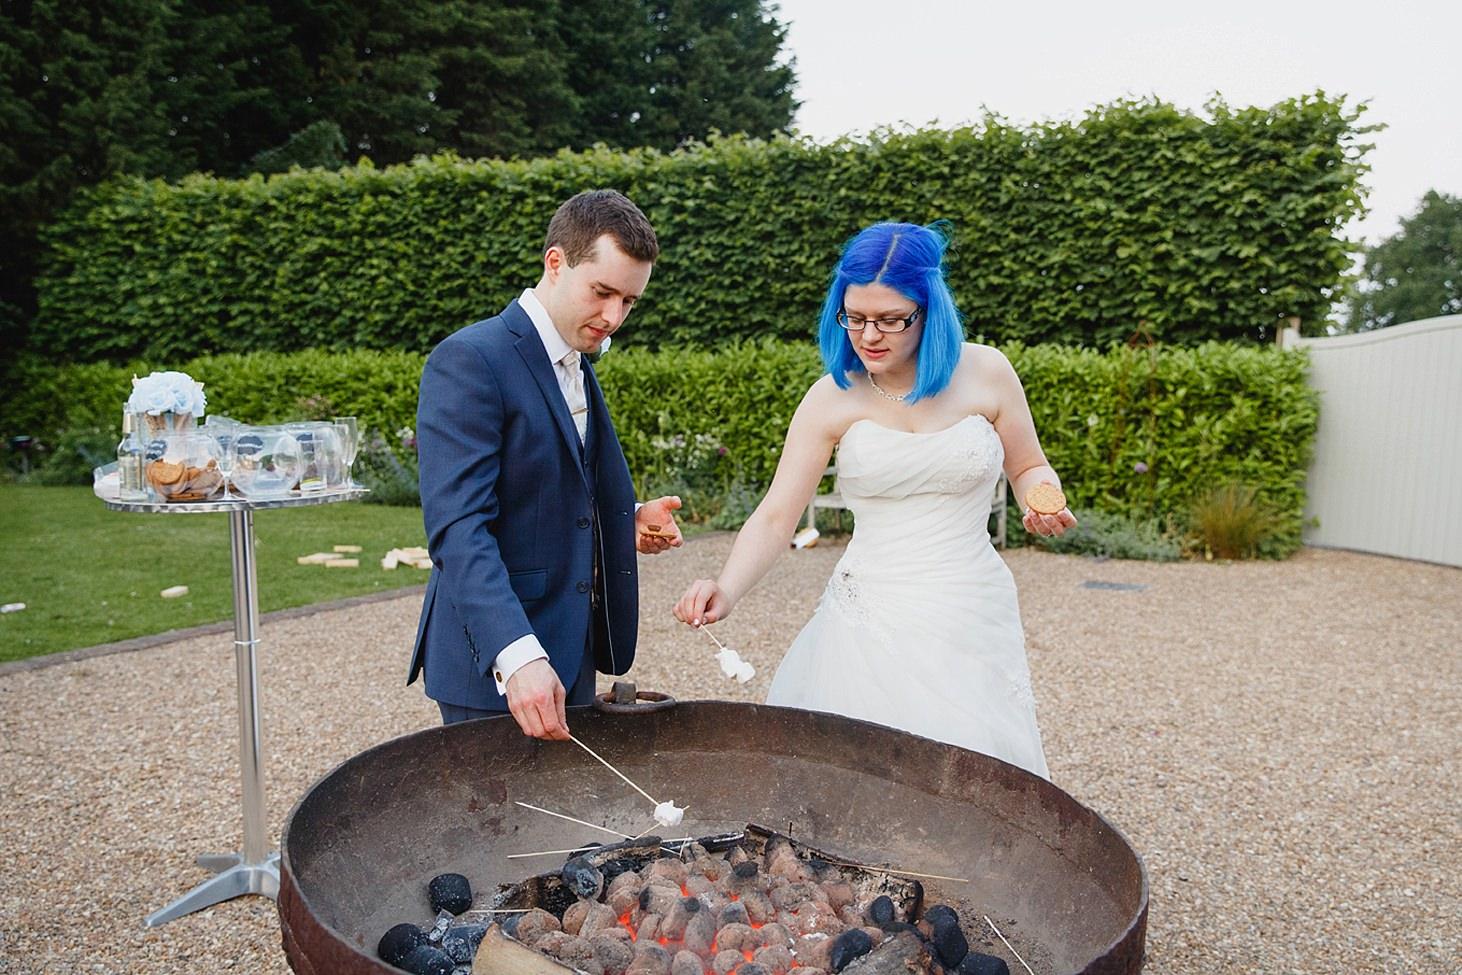 gate street barn wedding photography making smores